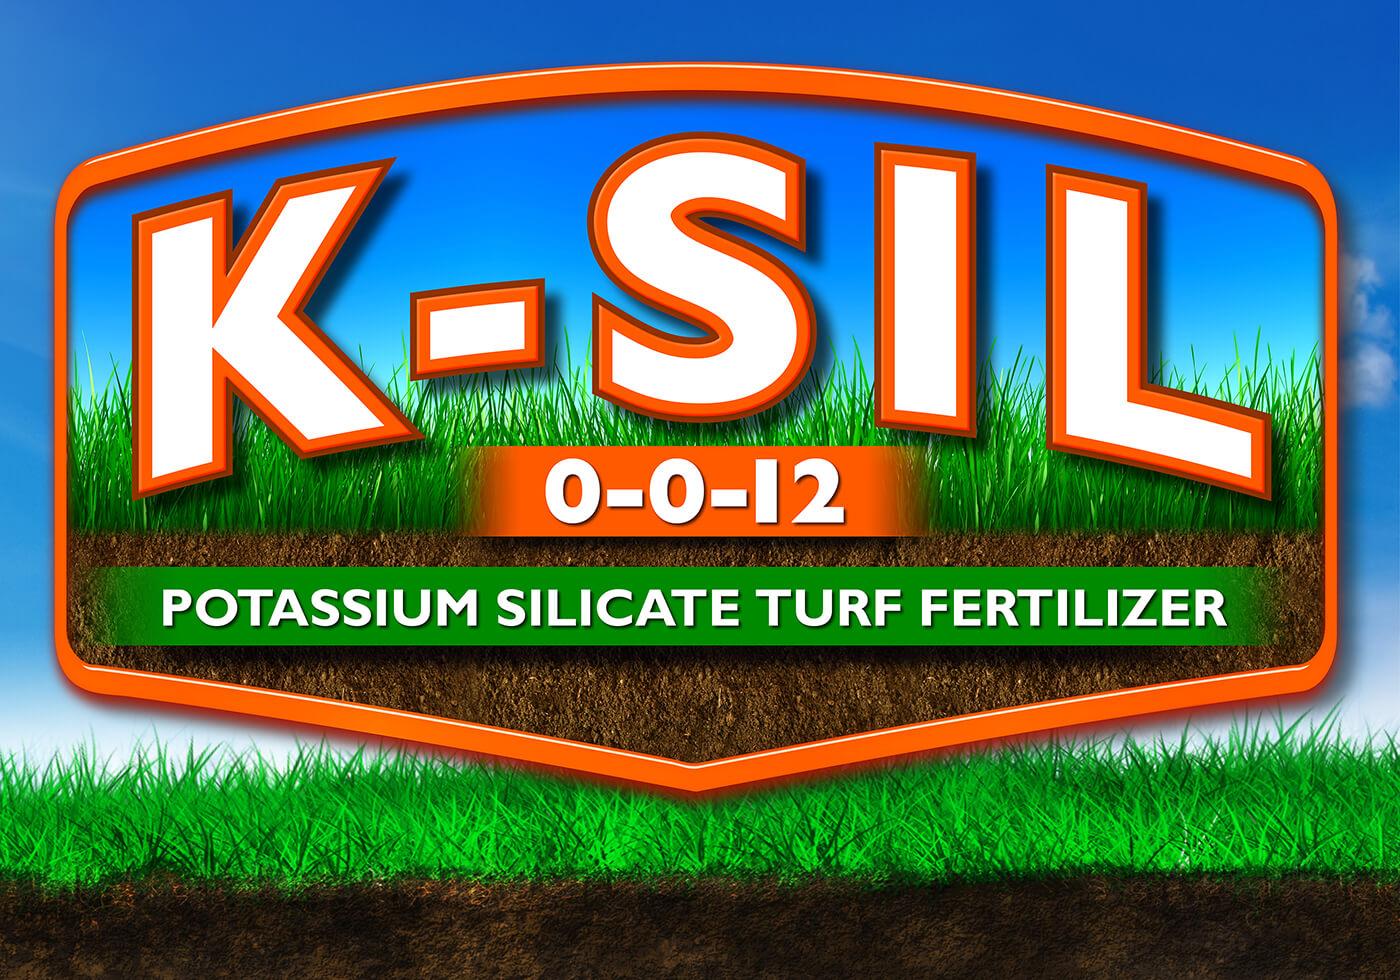 large orange k-sil 0-0-12 logo supplemental potassium silicate fertilizer over blue sky background grass and dirt